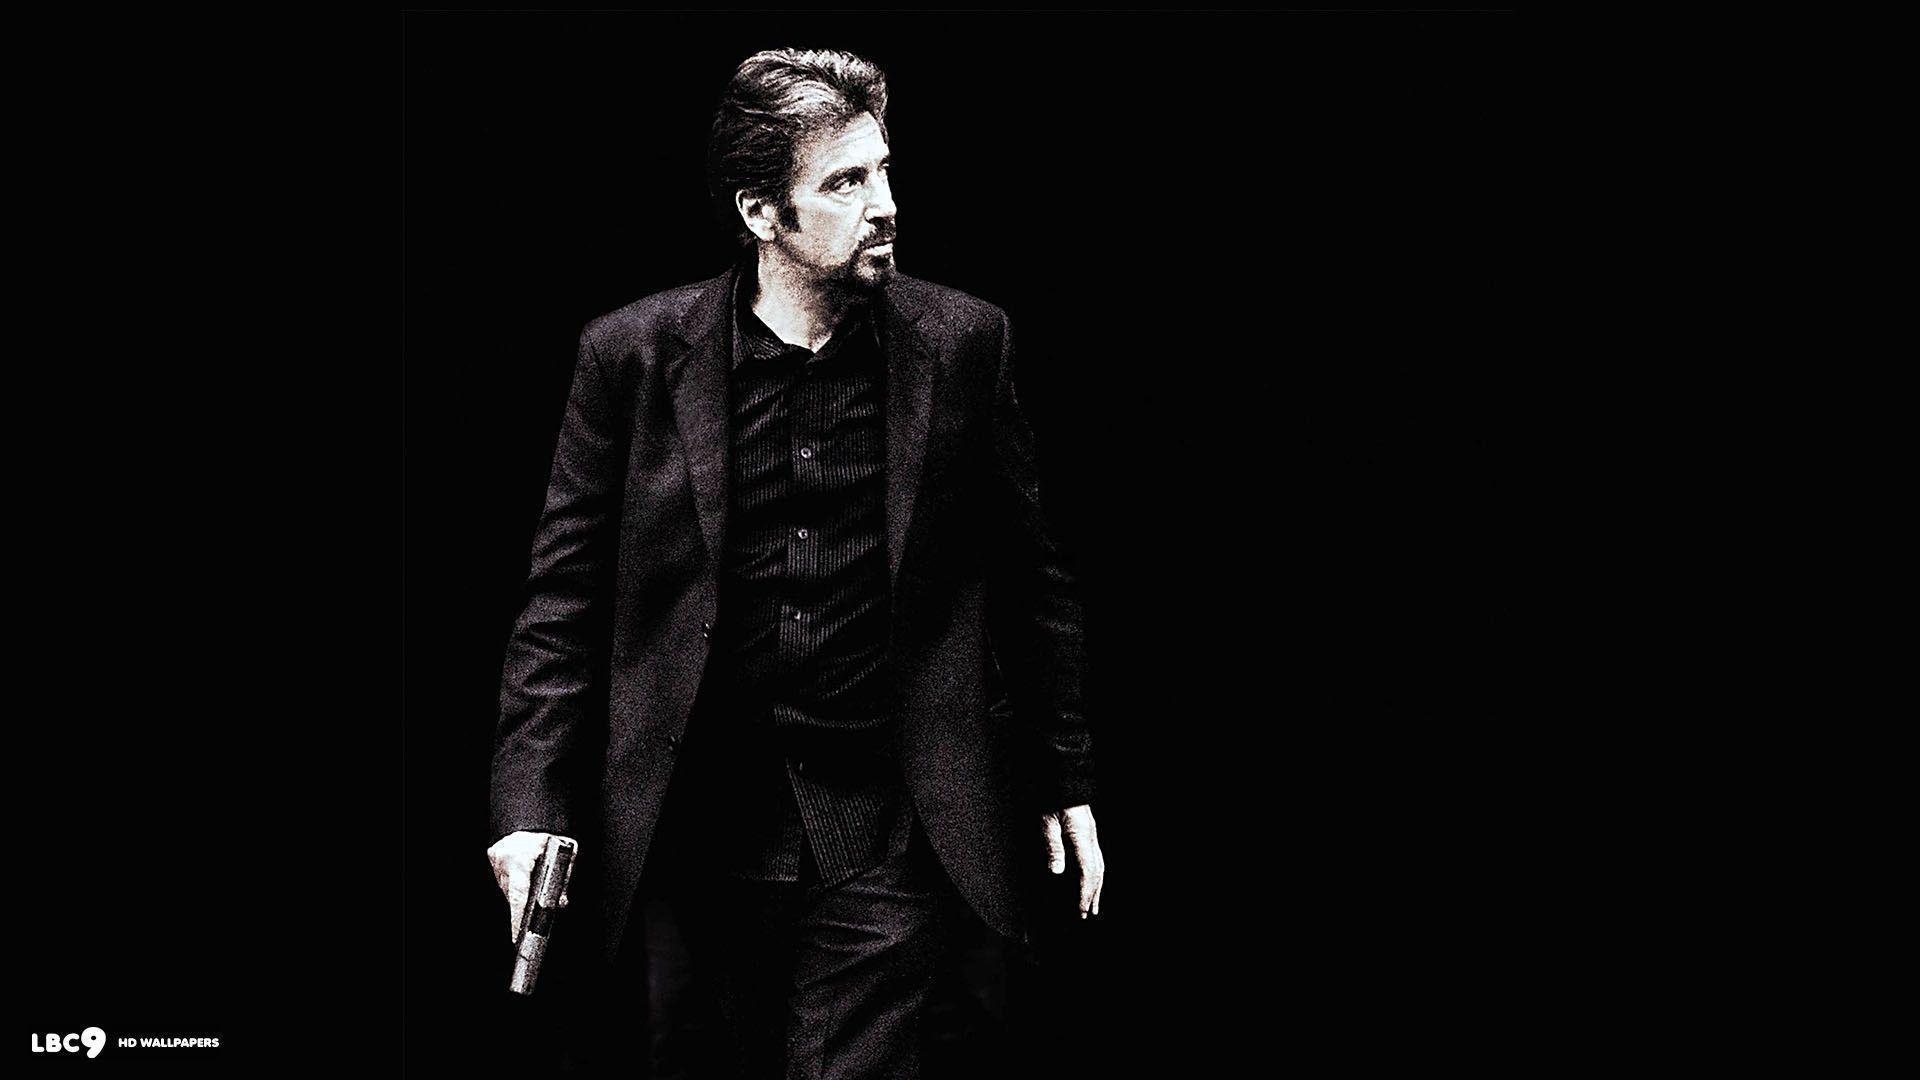 Al Pacino Gangster Wallpaper